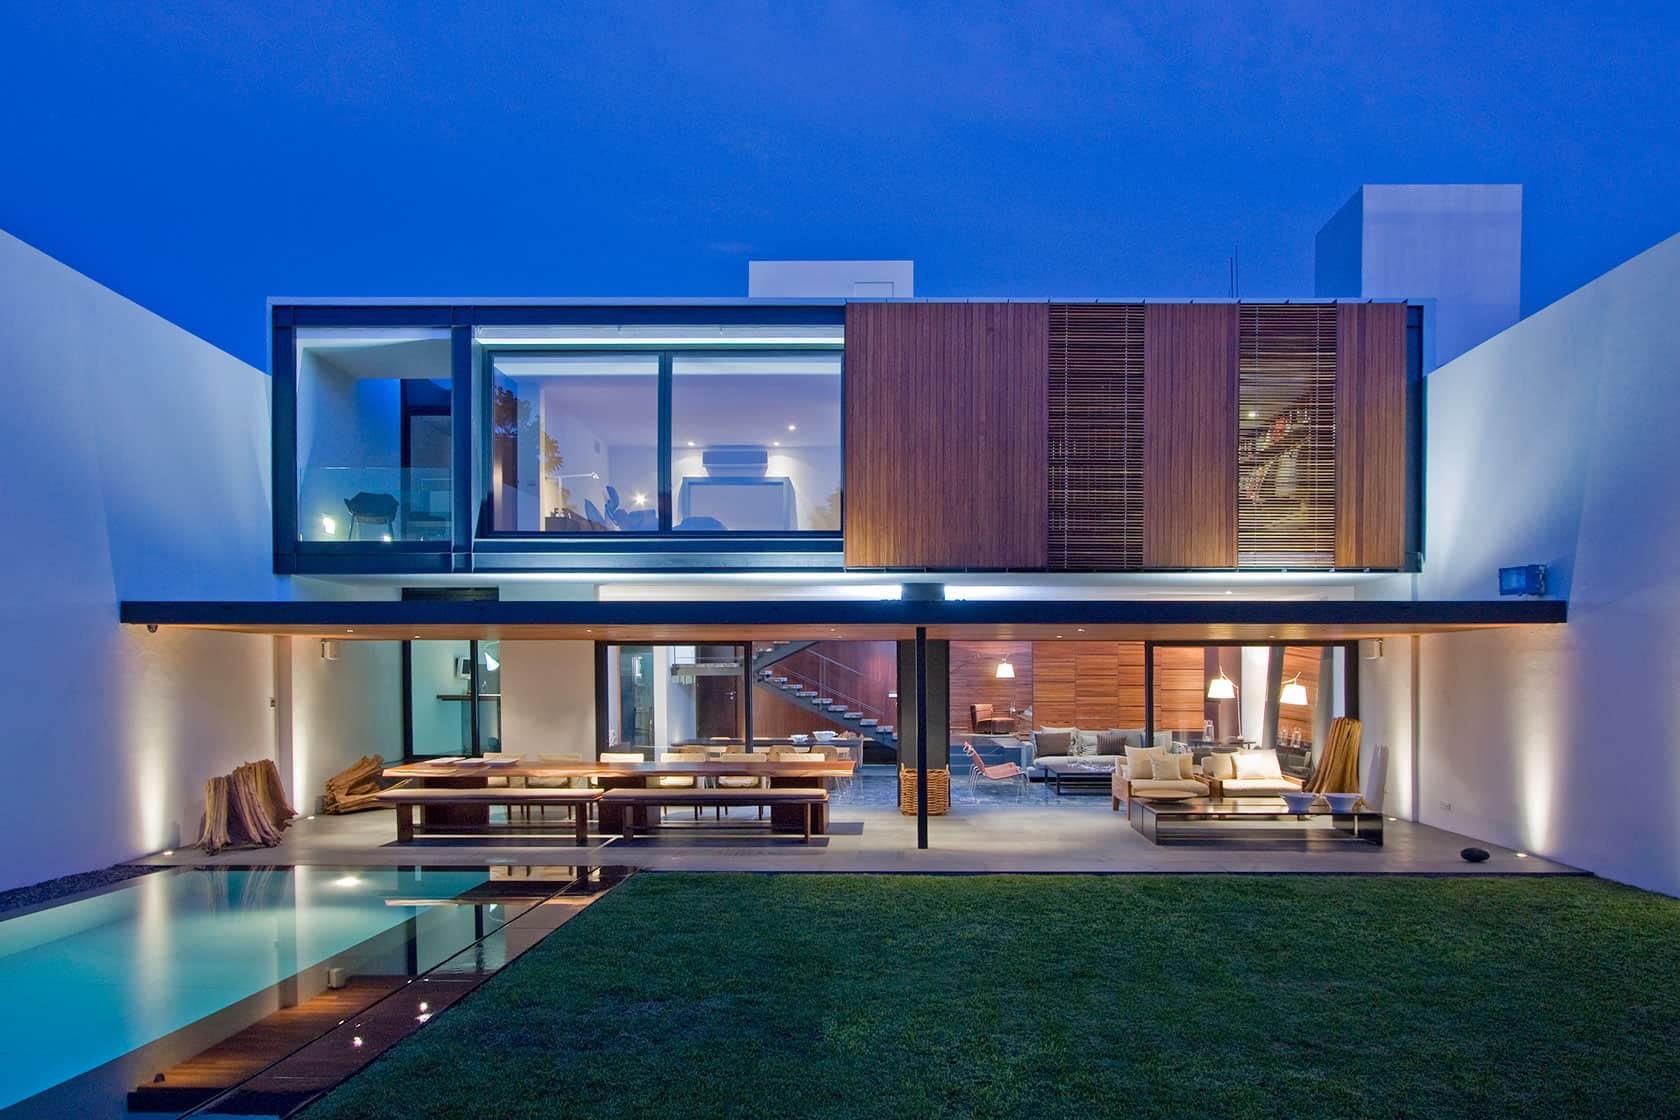 Casa ro by el as rizo arquitectos for Casa de arquitecto moderno